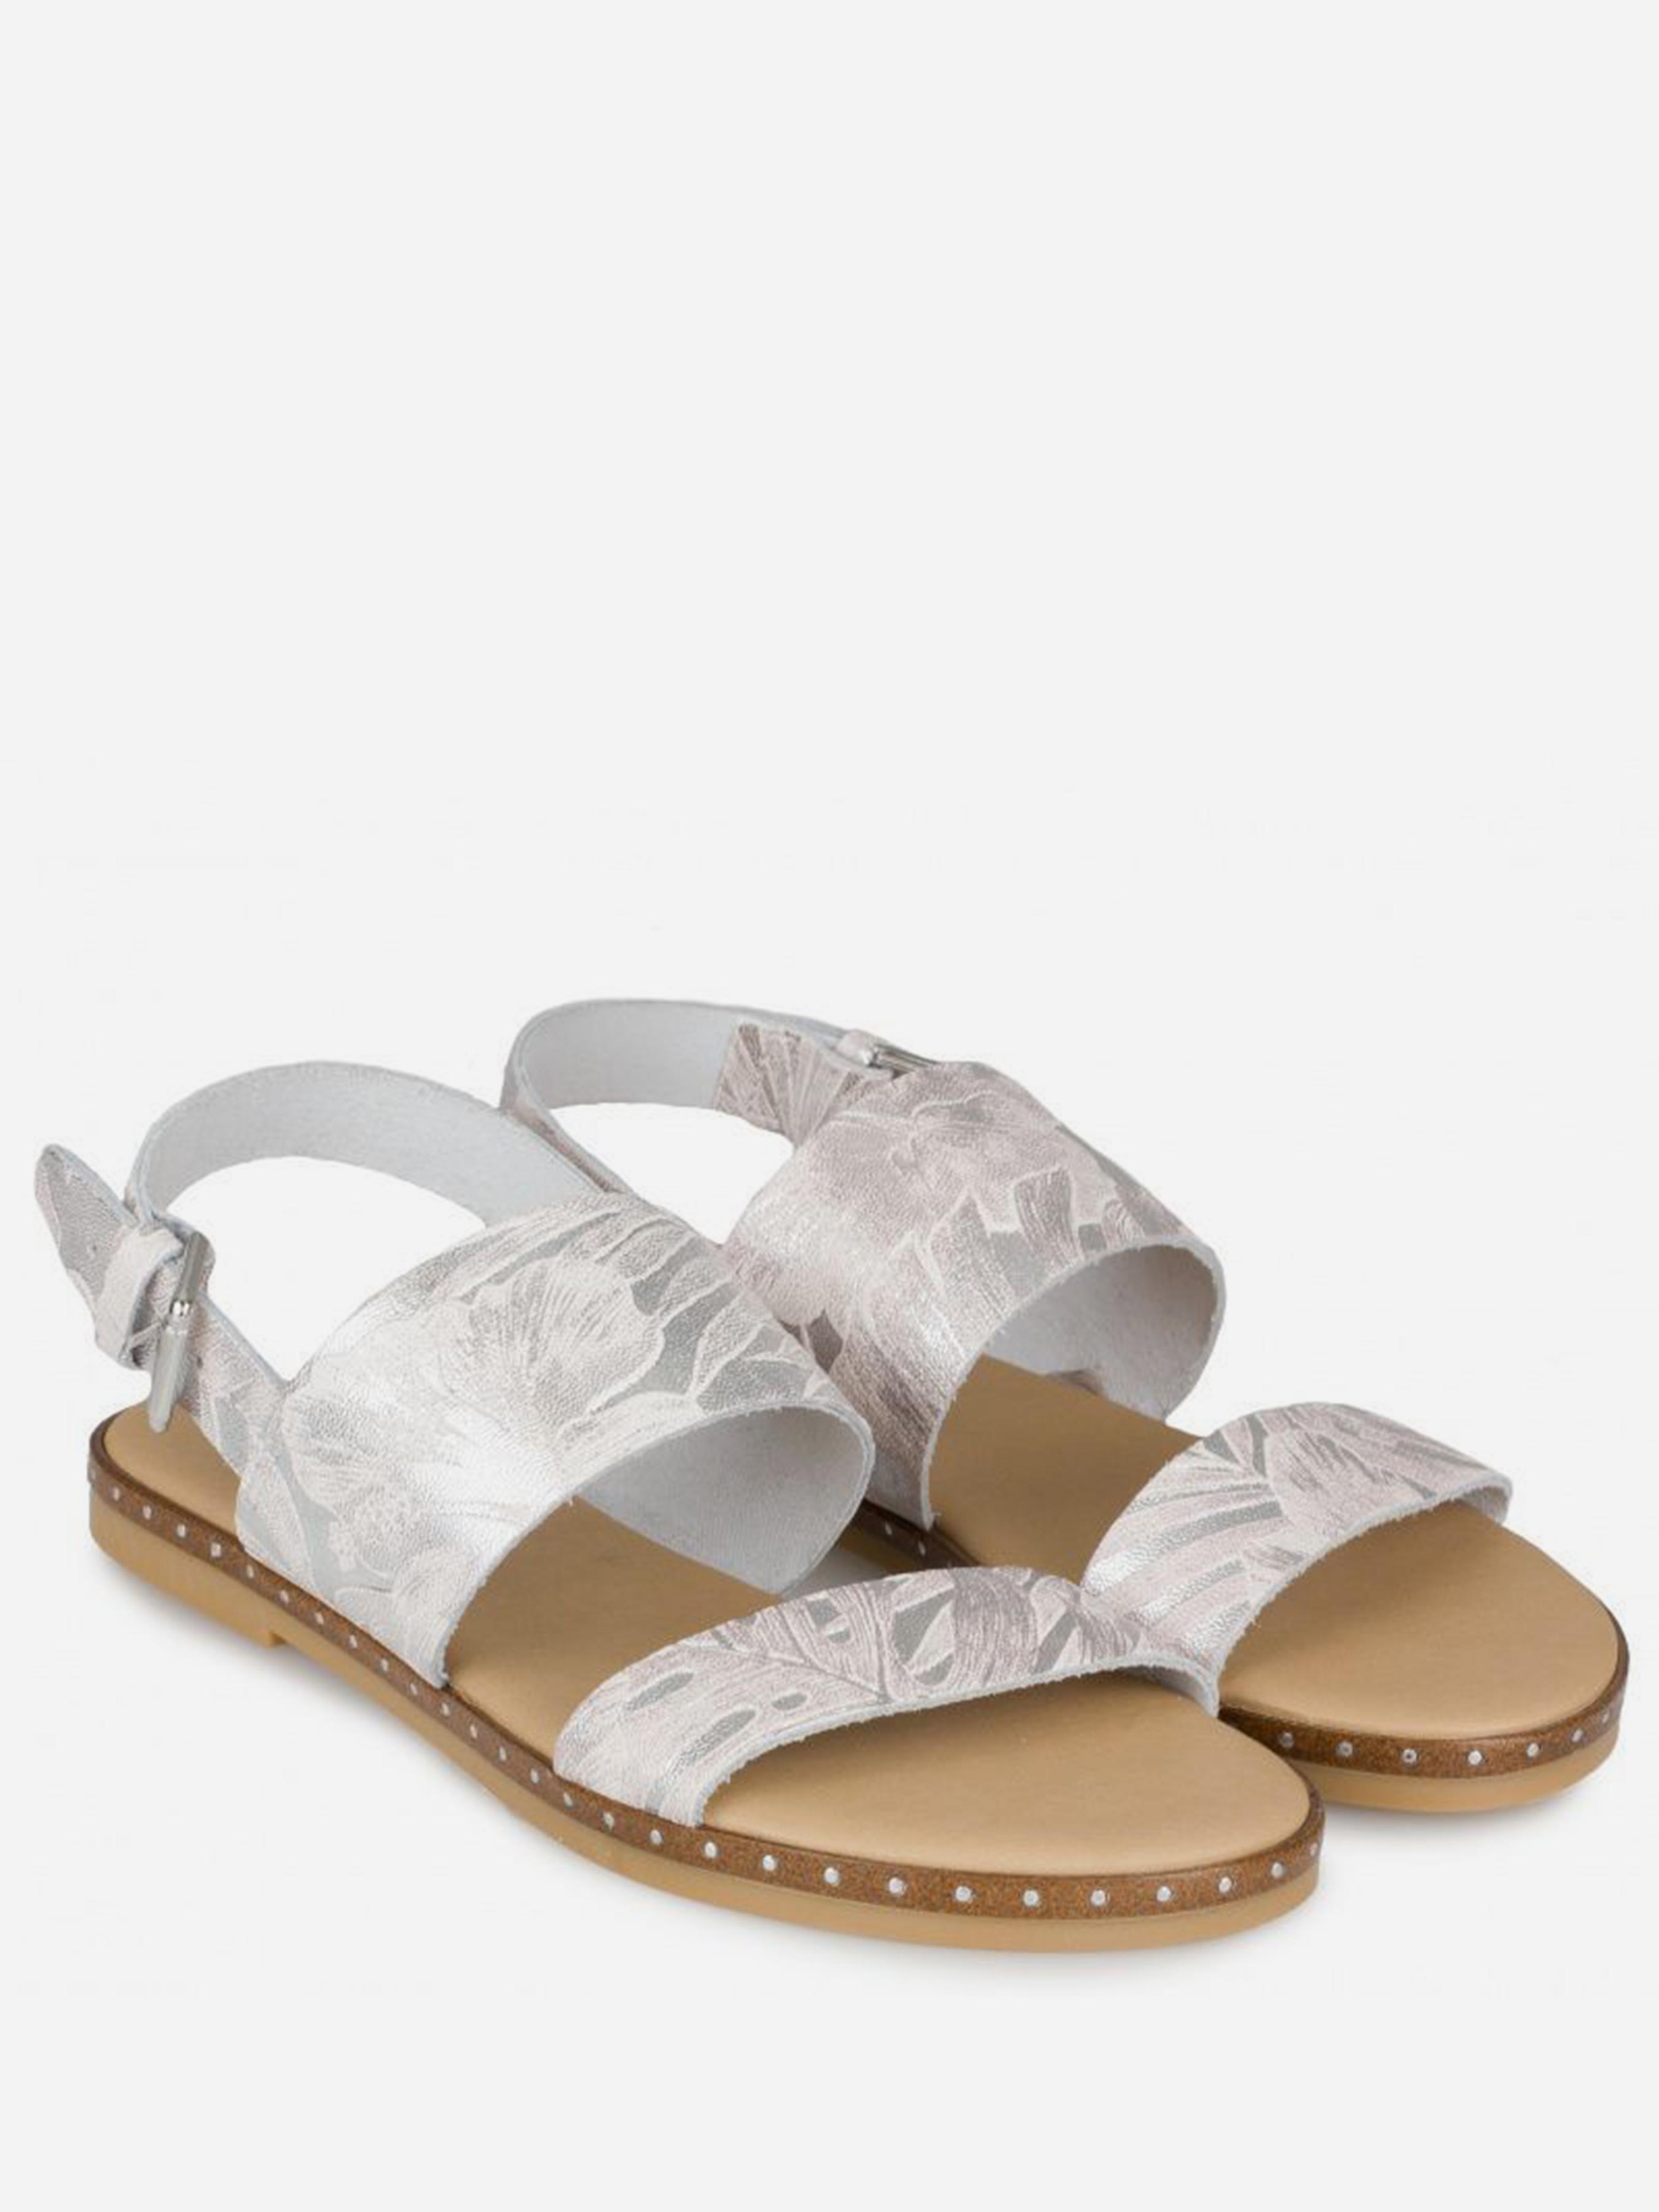 Сандалии для женщин Casta & Dolly 1Z6 модная обувь, 2017